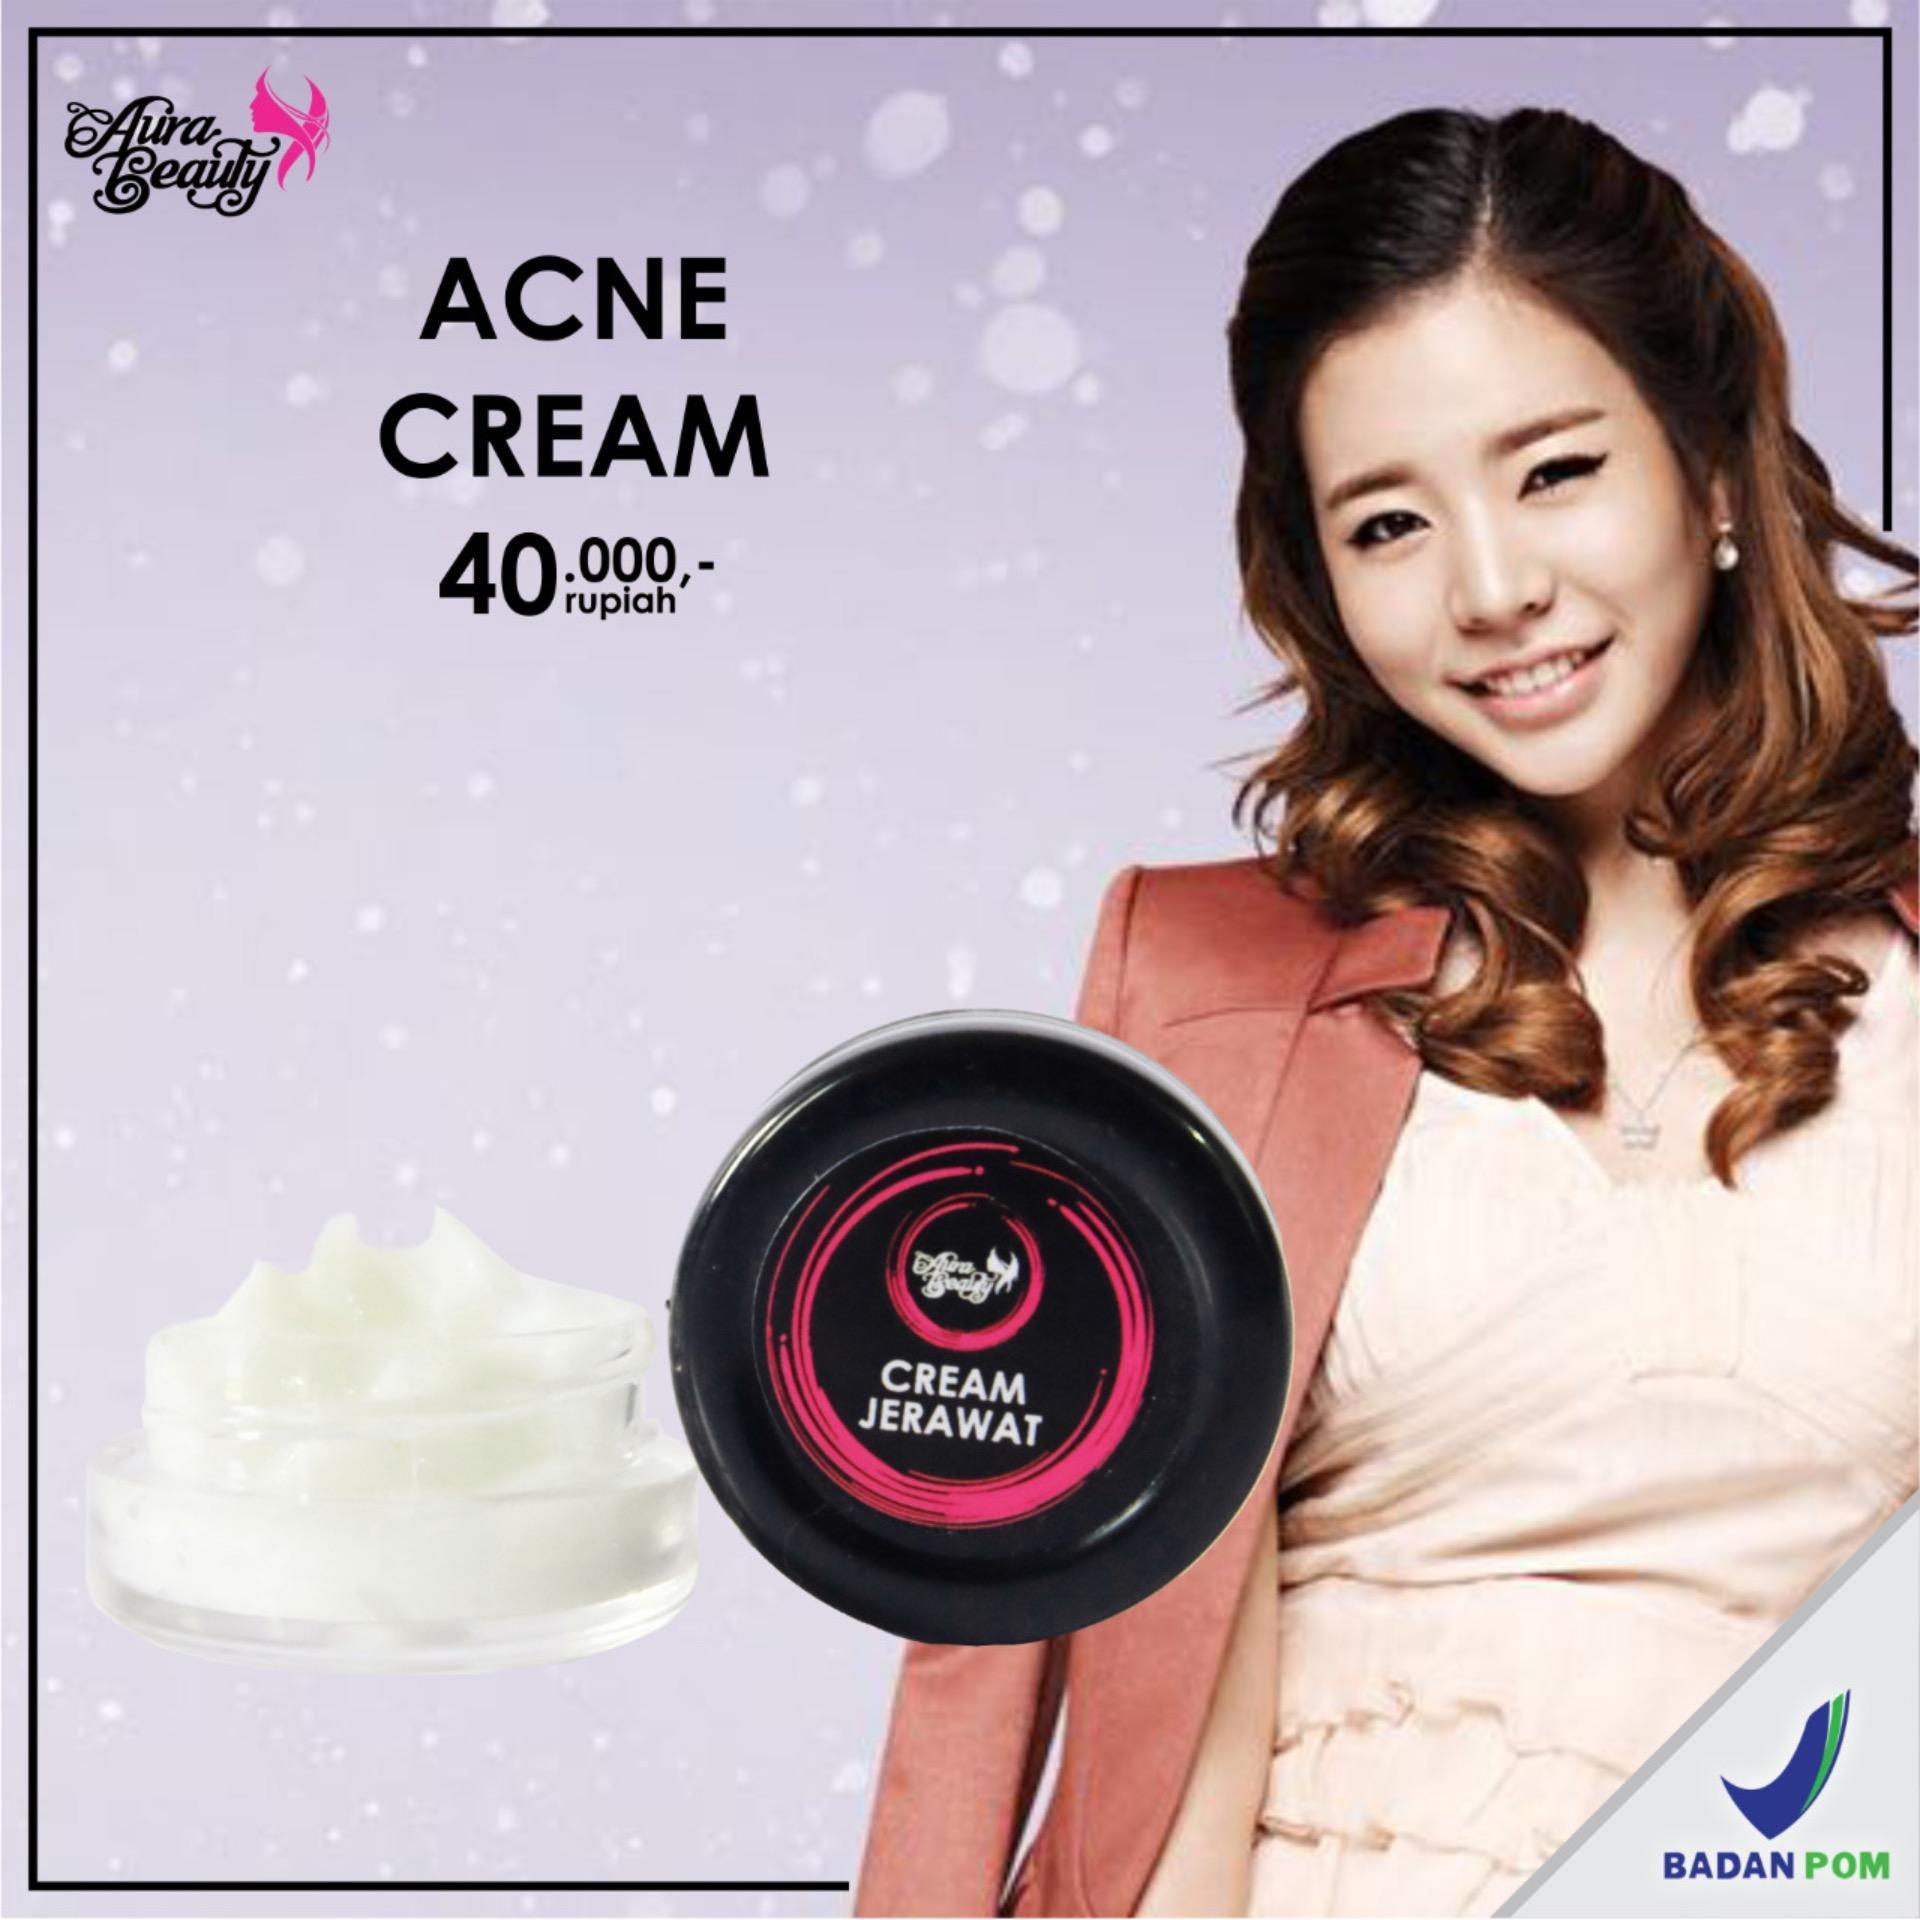 Aurabeauty Acne Cream